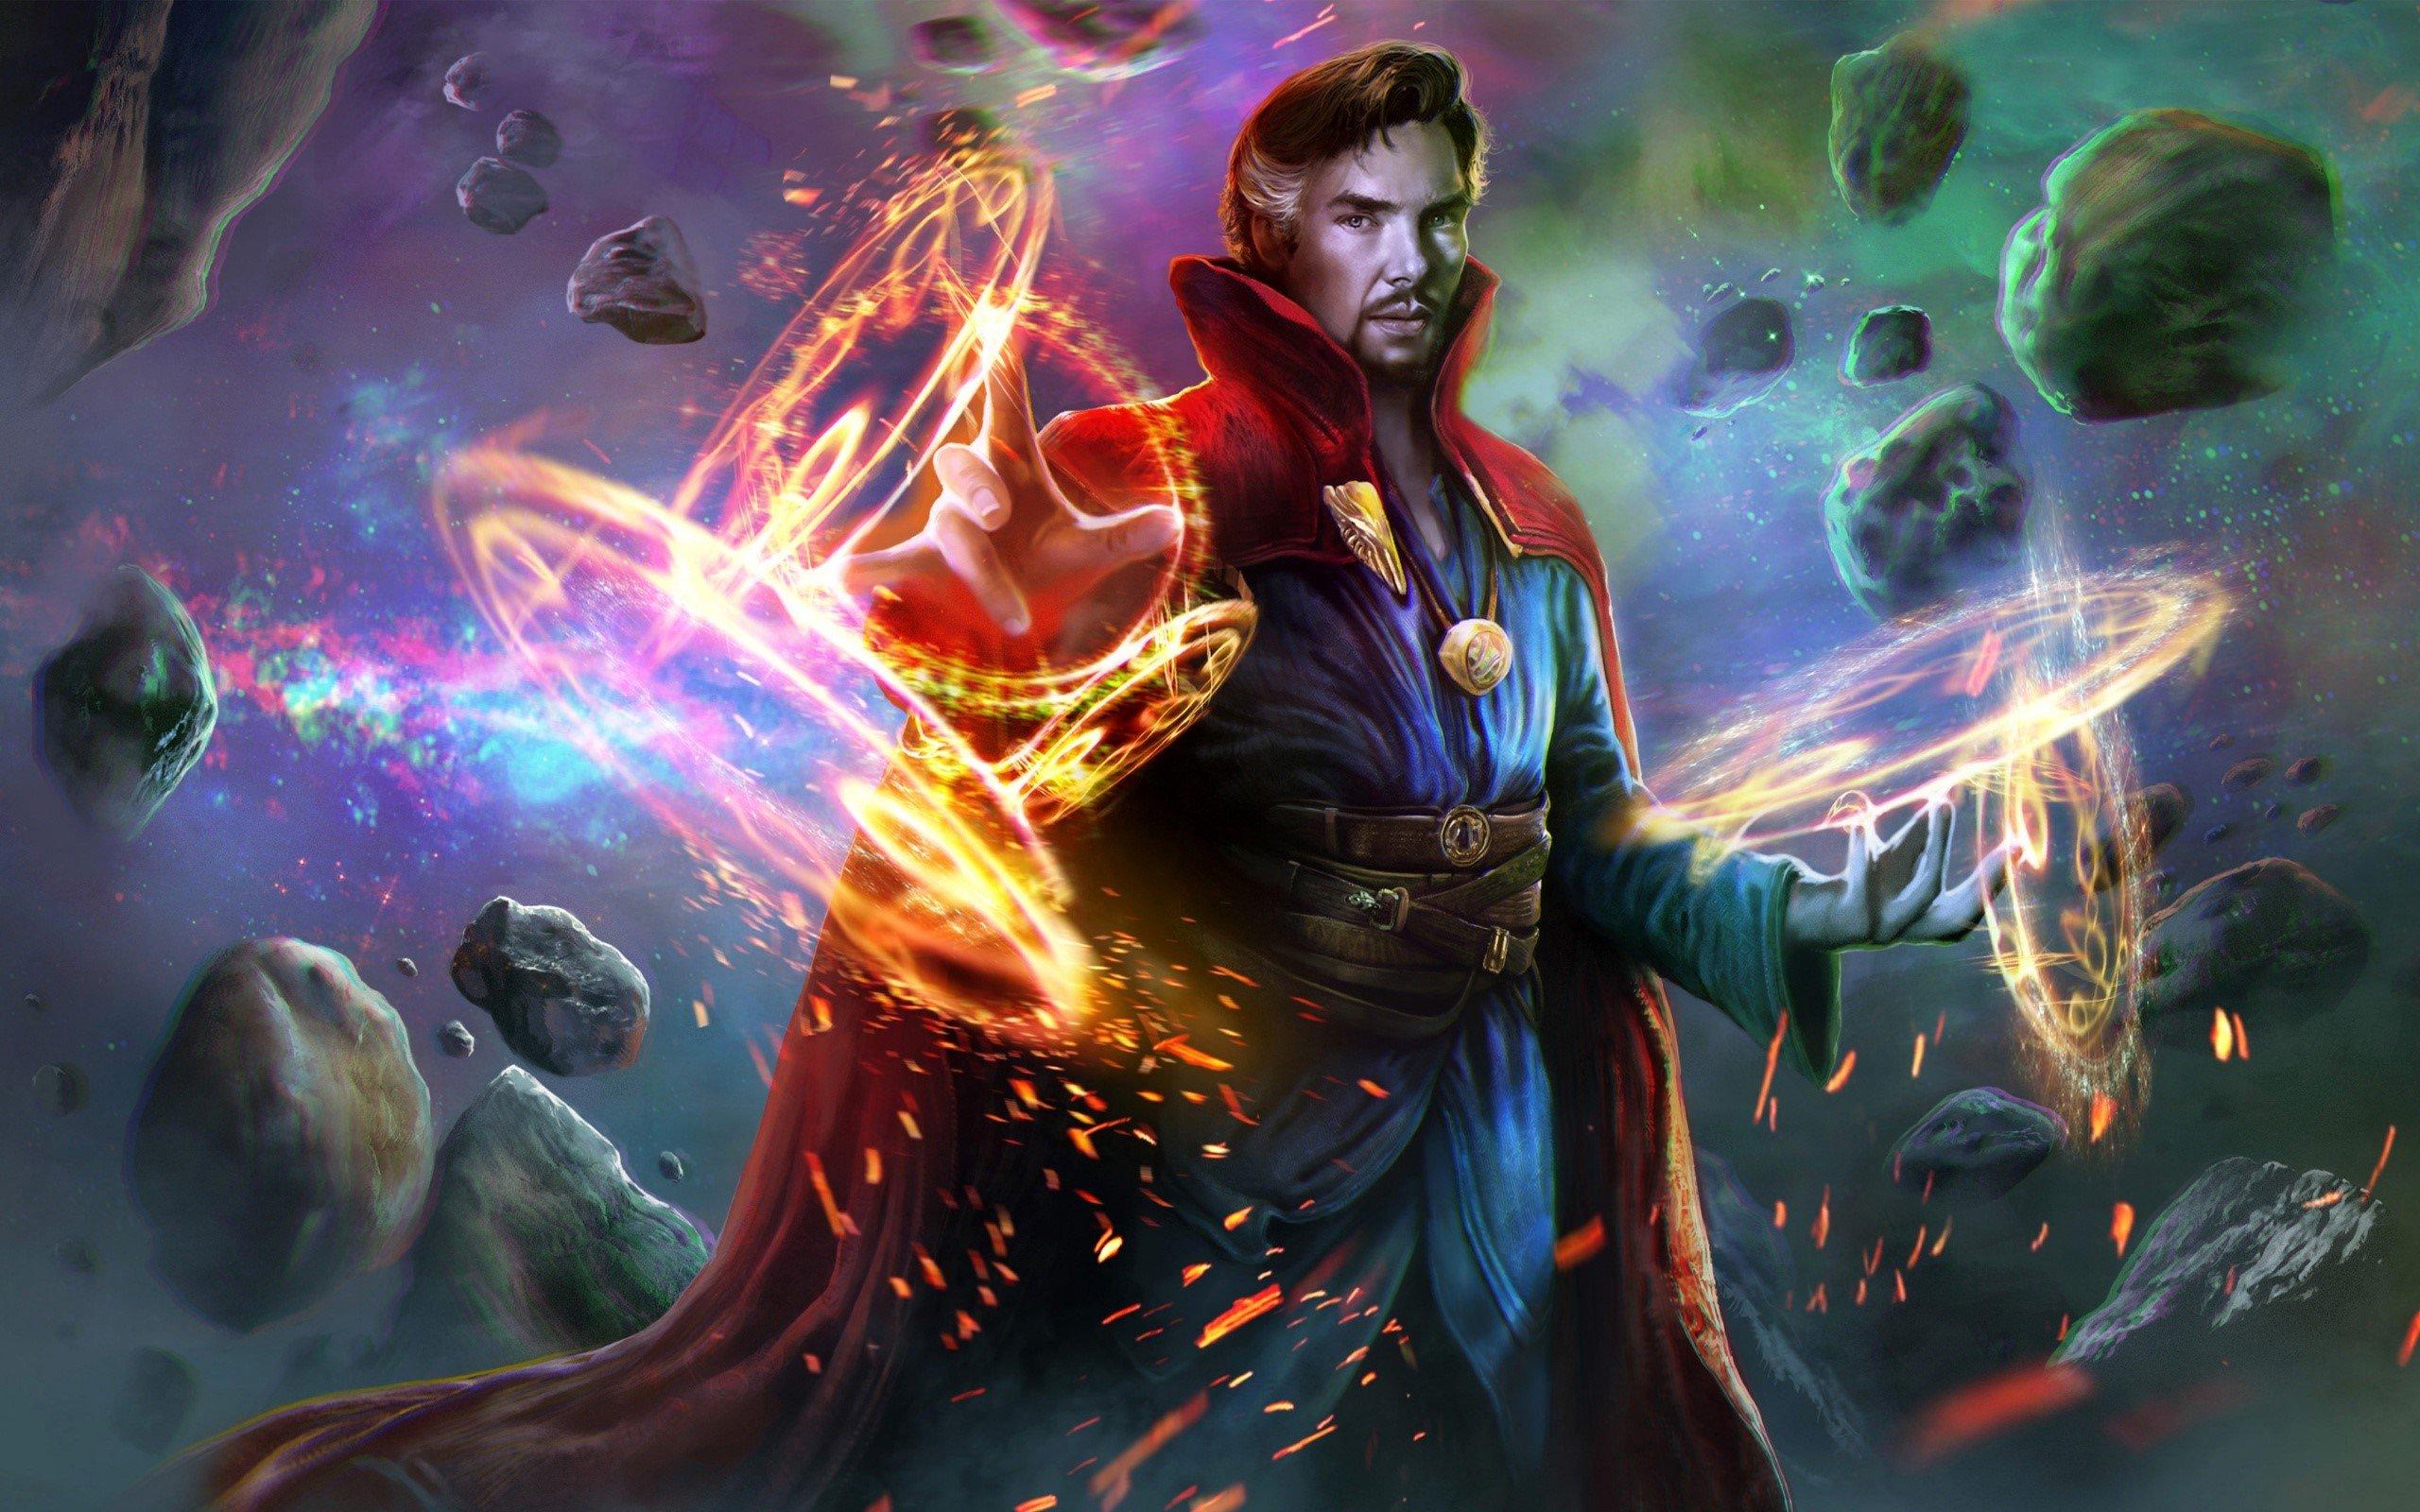 Fondos de pantalla Fan art de Doctor Strange